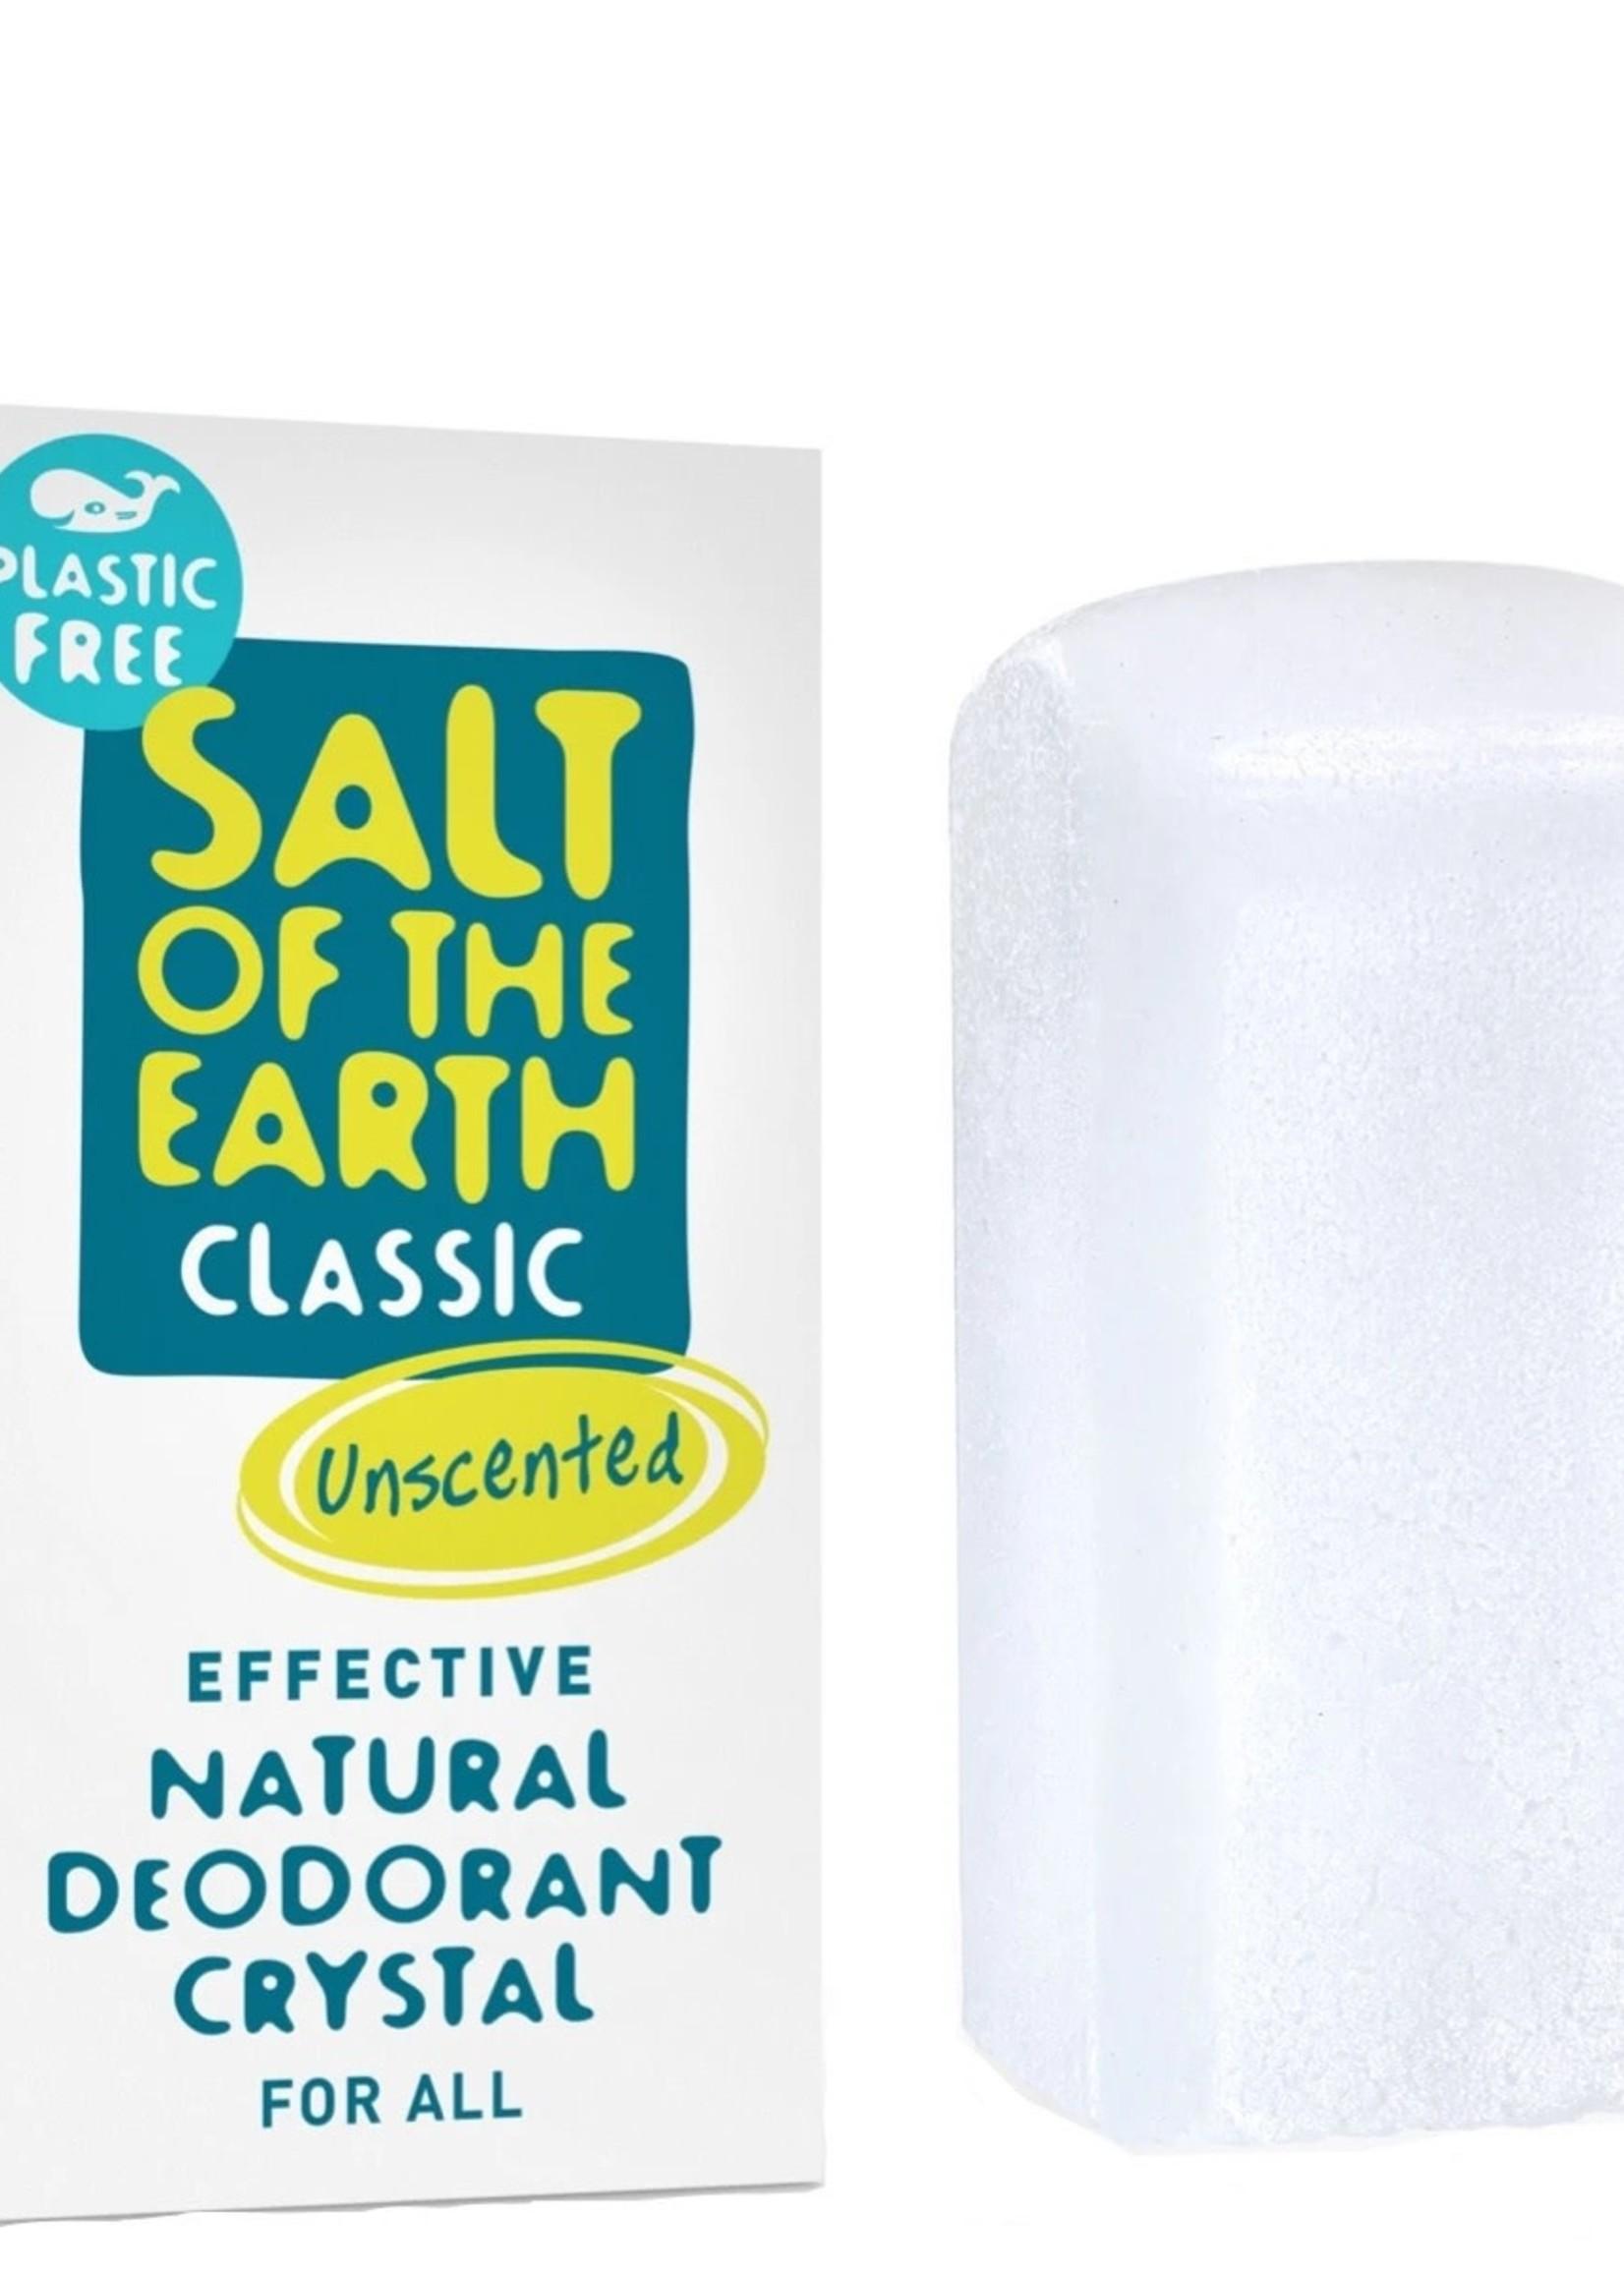 Deodorant crystal rock - unscented